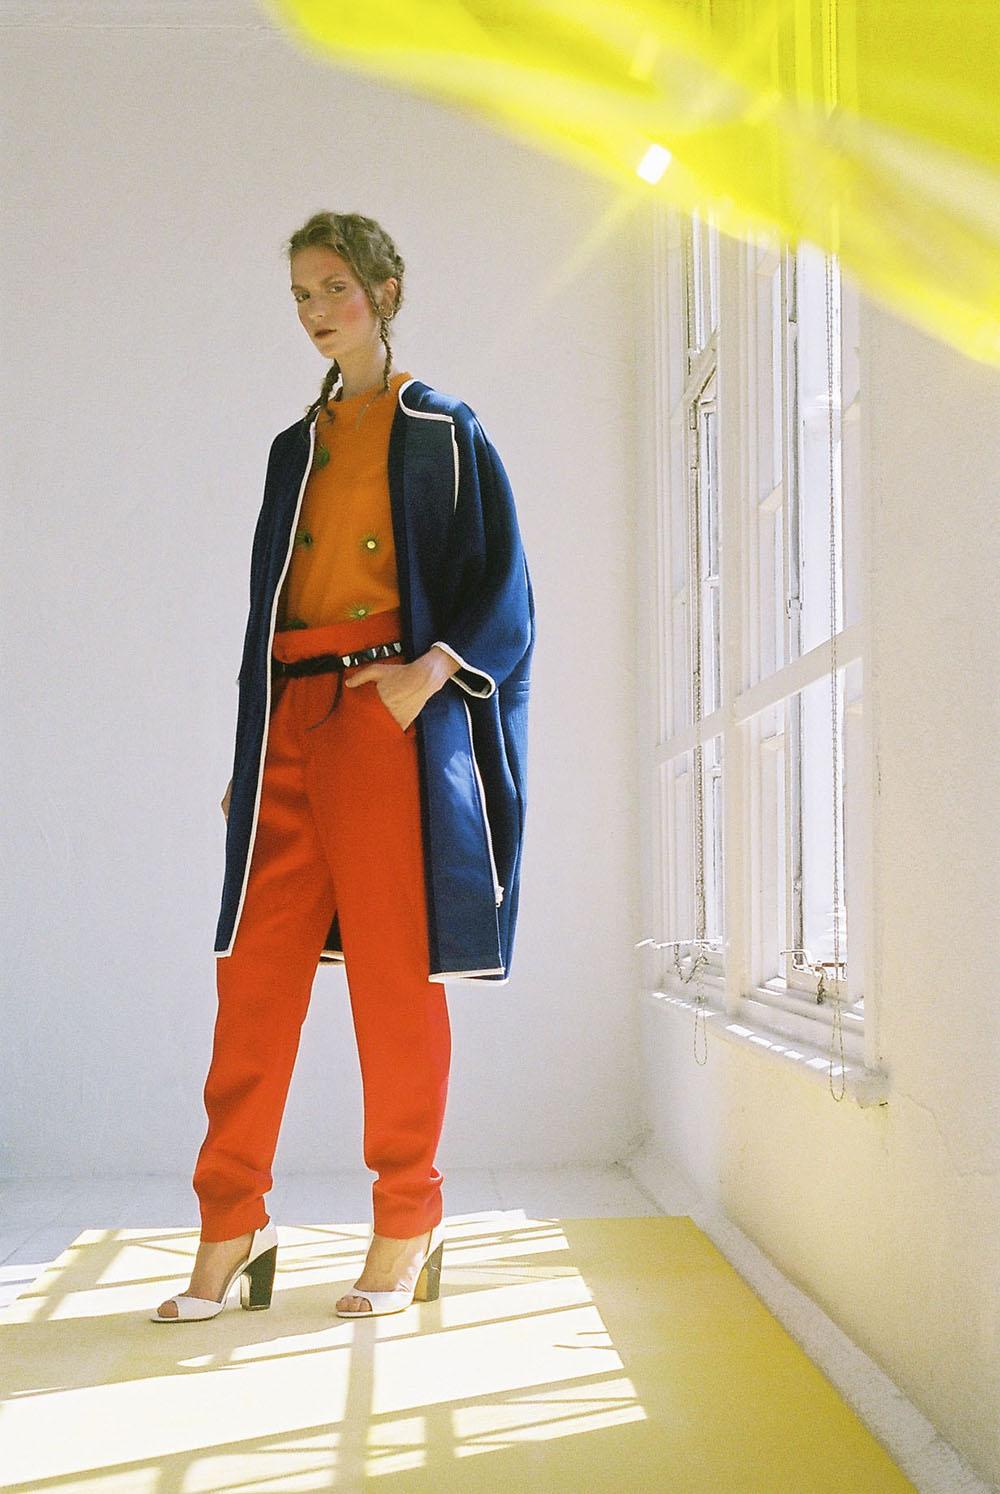 PHOENIX MAGAZINE Coat L F MARKEY, Jumper TRINE LINDEGAARD, Red trousers Á La Disposition, Belt MAISON SCOTCH ,Shoes Vintage, Earrings JEN CHEEMA